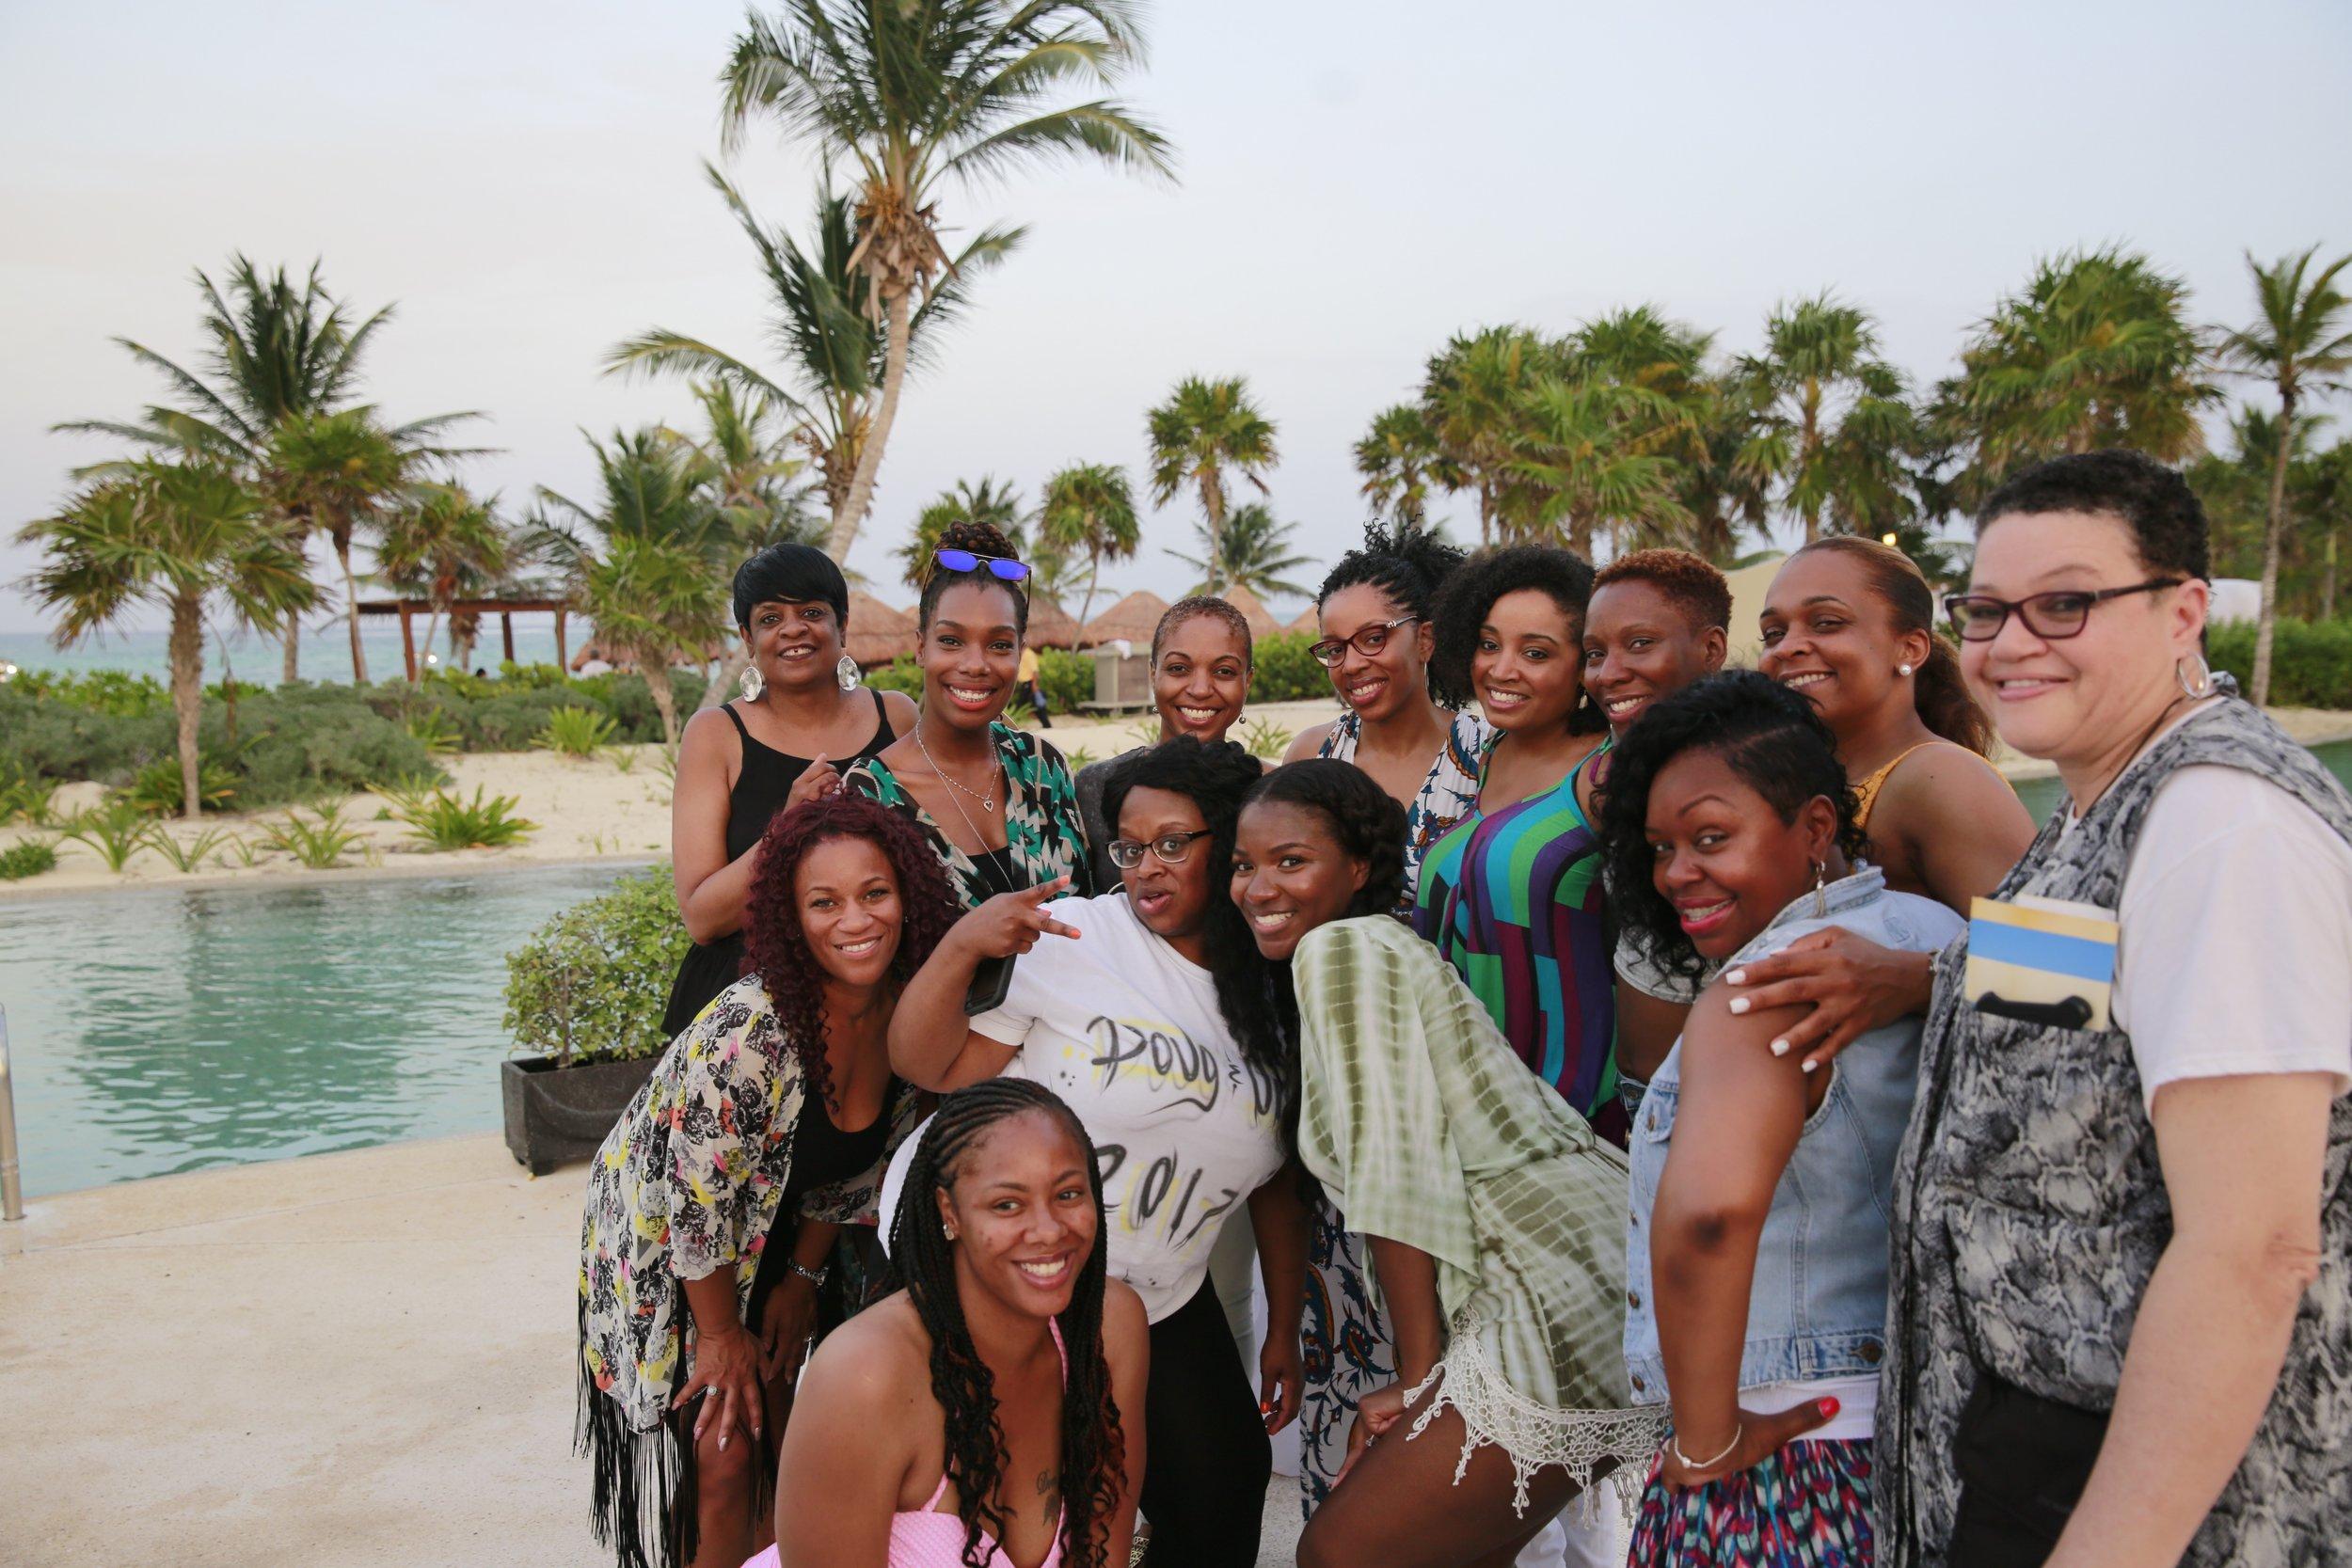 Black Destination Bride - BlackDesti Wedding Countdown Journal - Bridefriends Podcast - 3 Playa del Carmen Mexico - Secrets Maroma Welcome Pool9.jpg